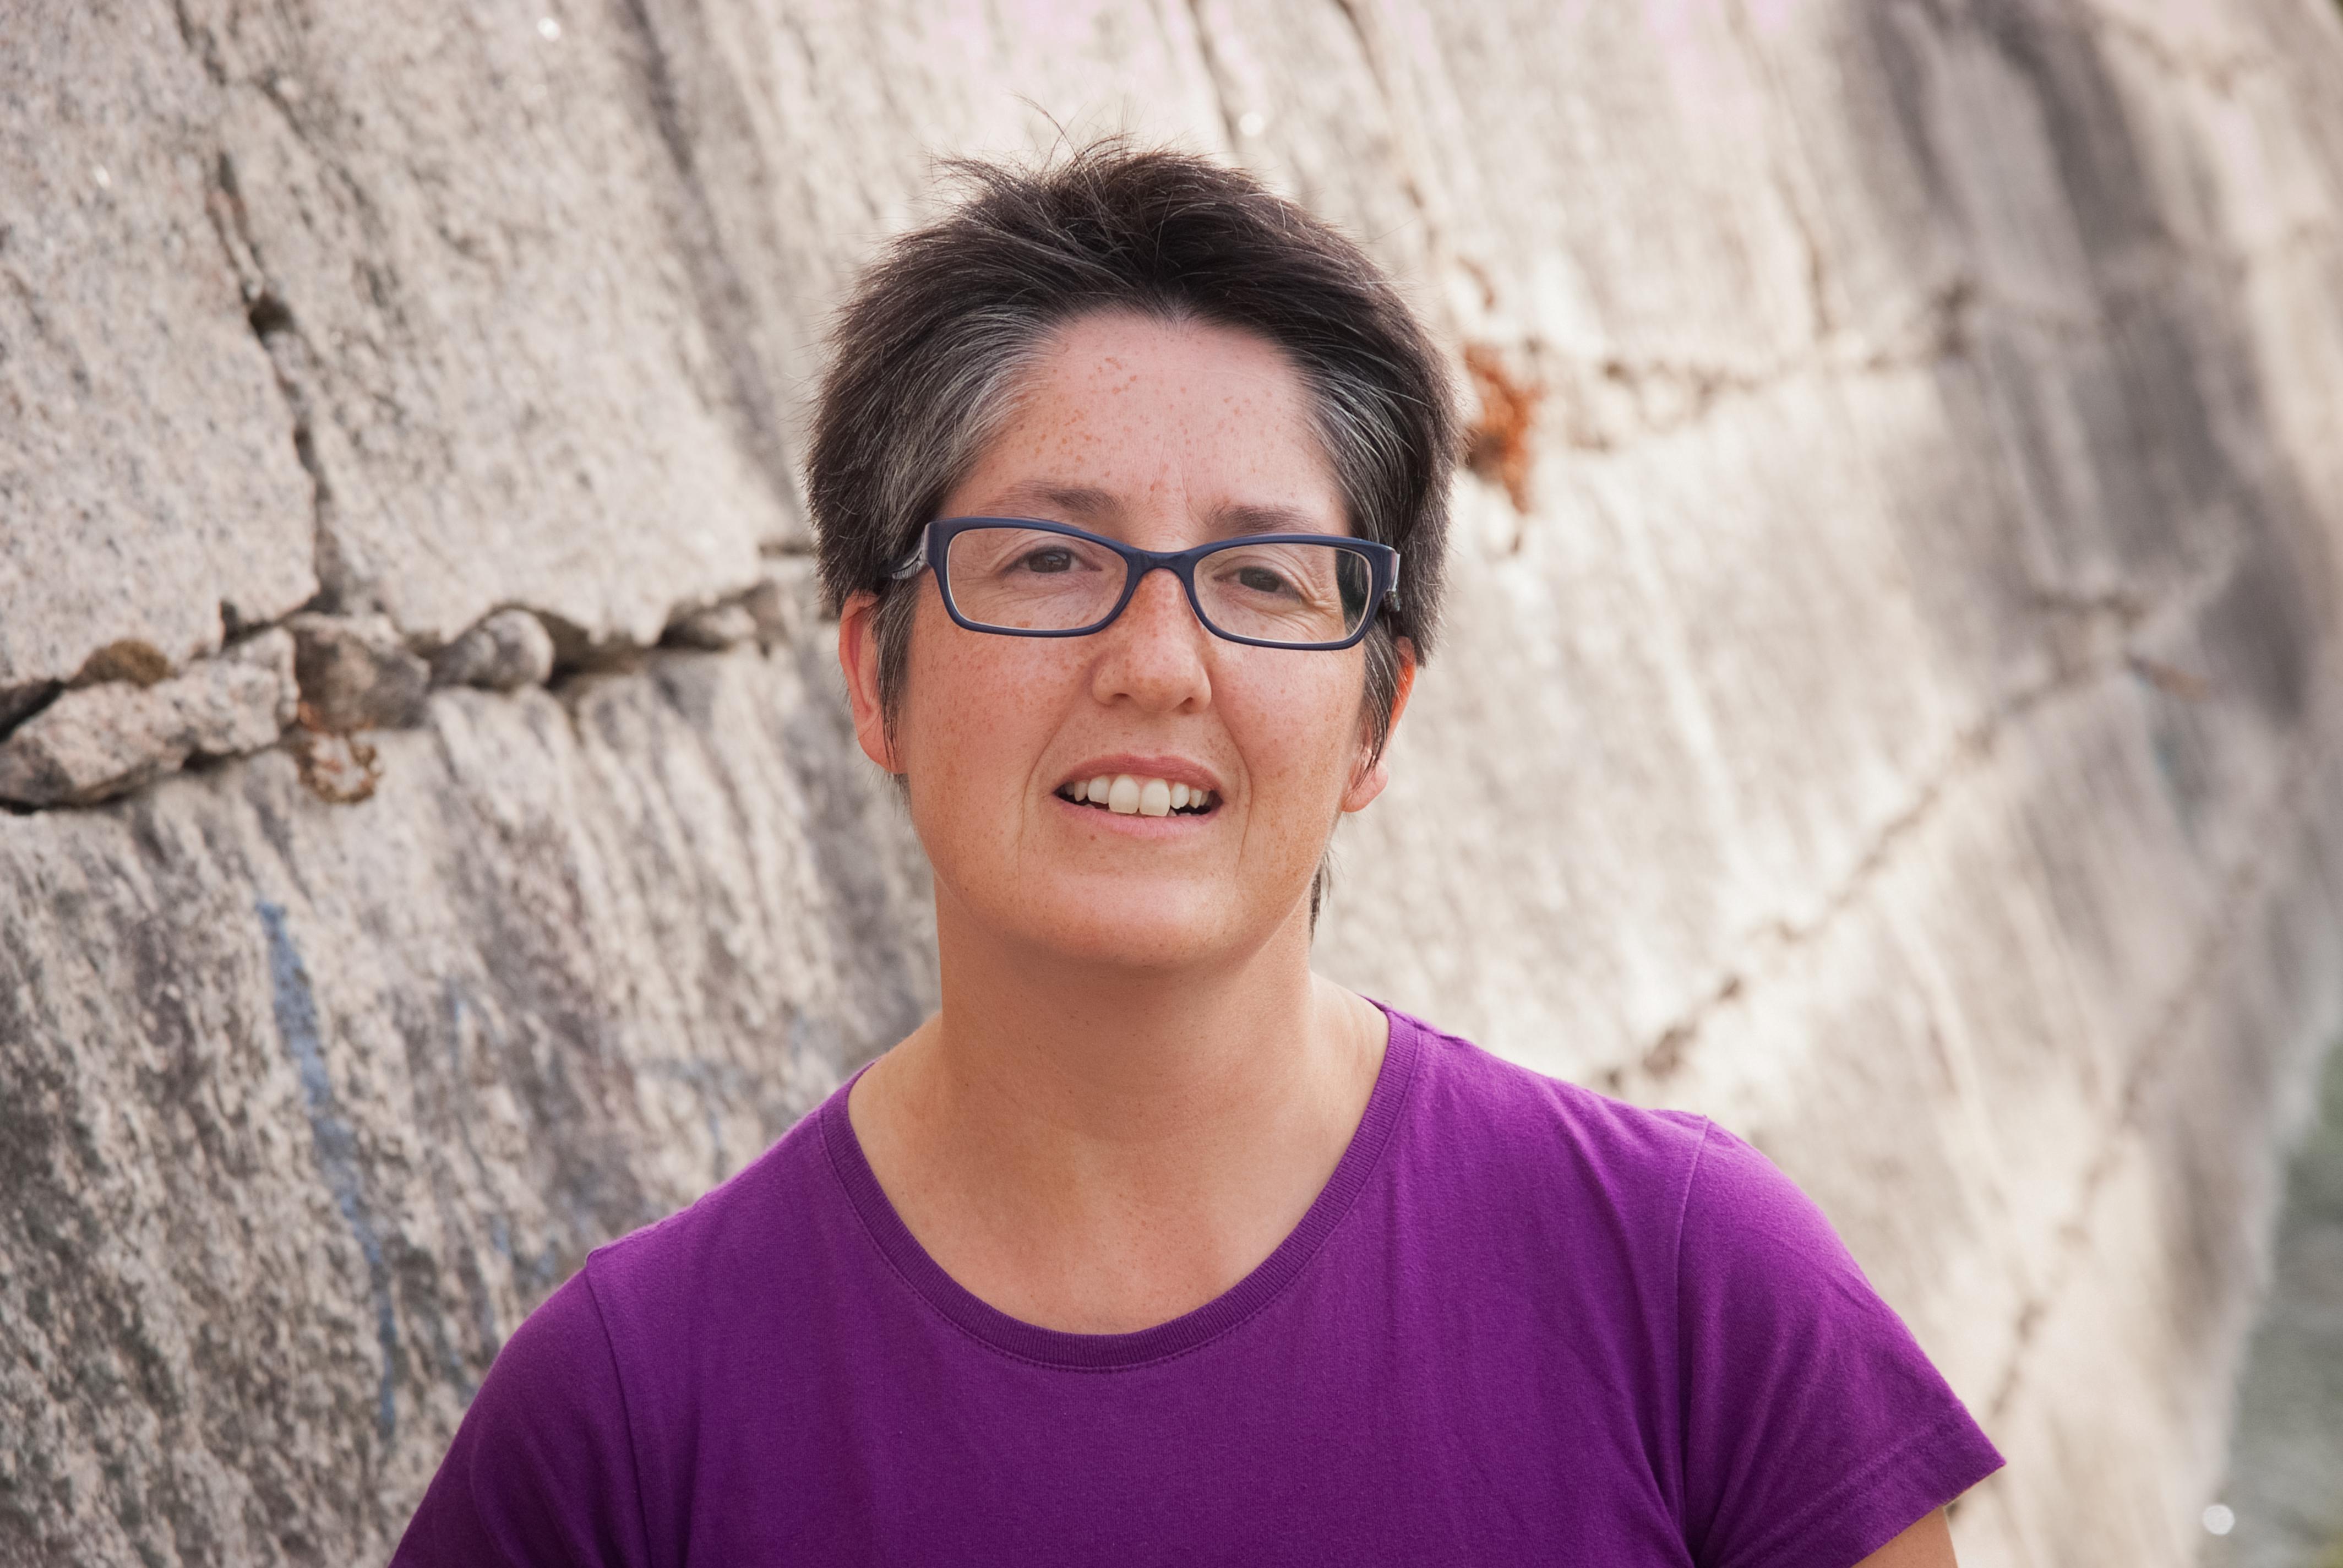 Susana Sanches Arins